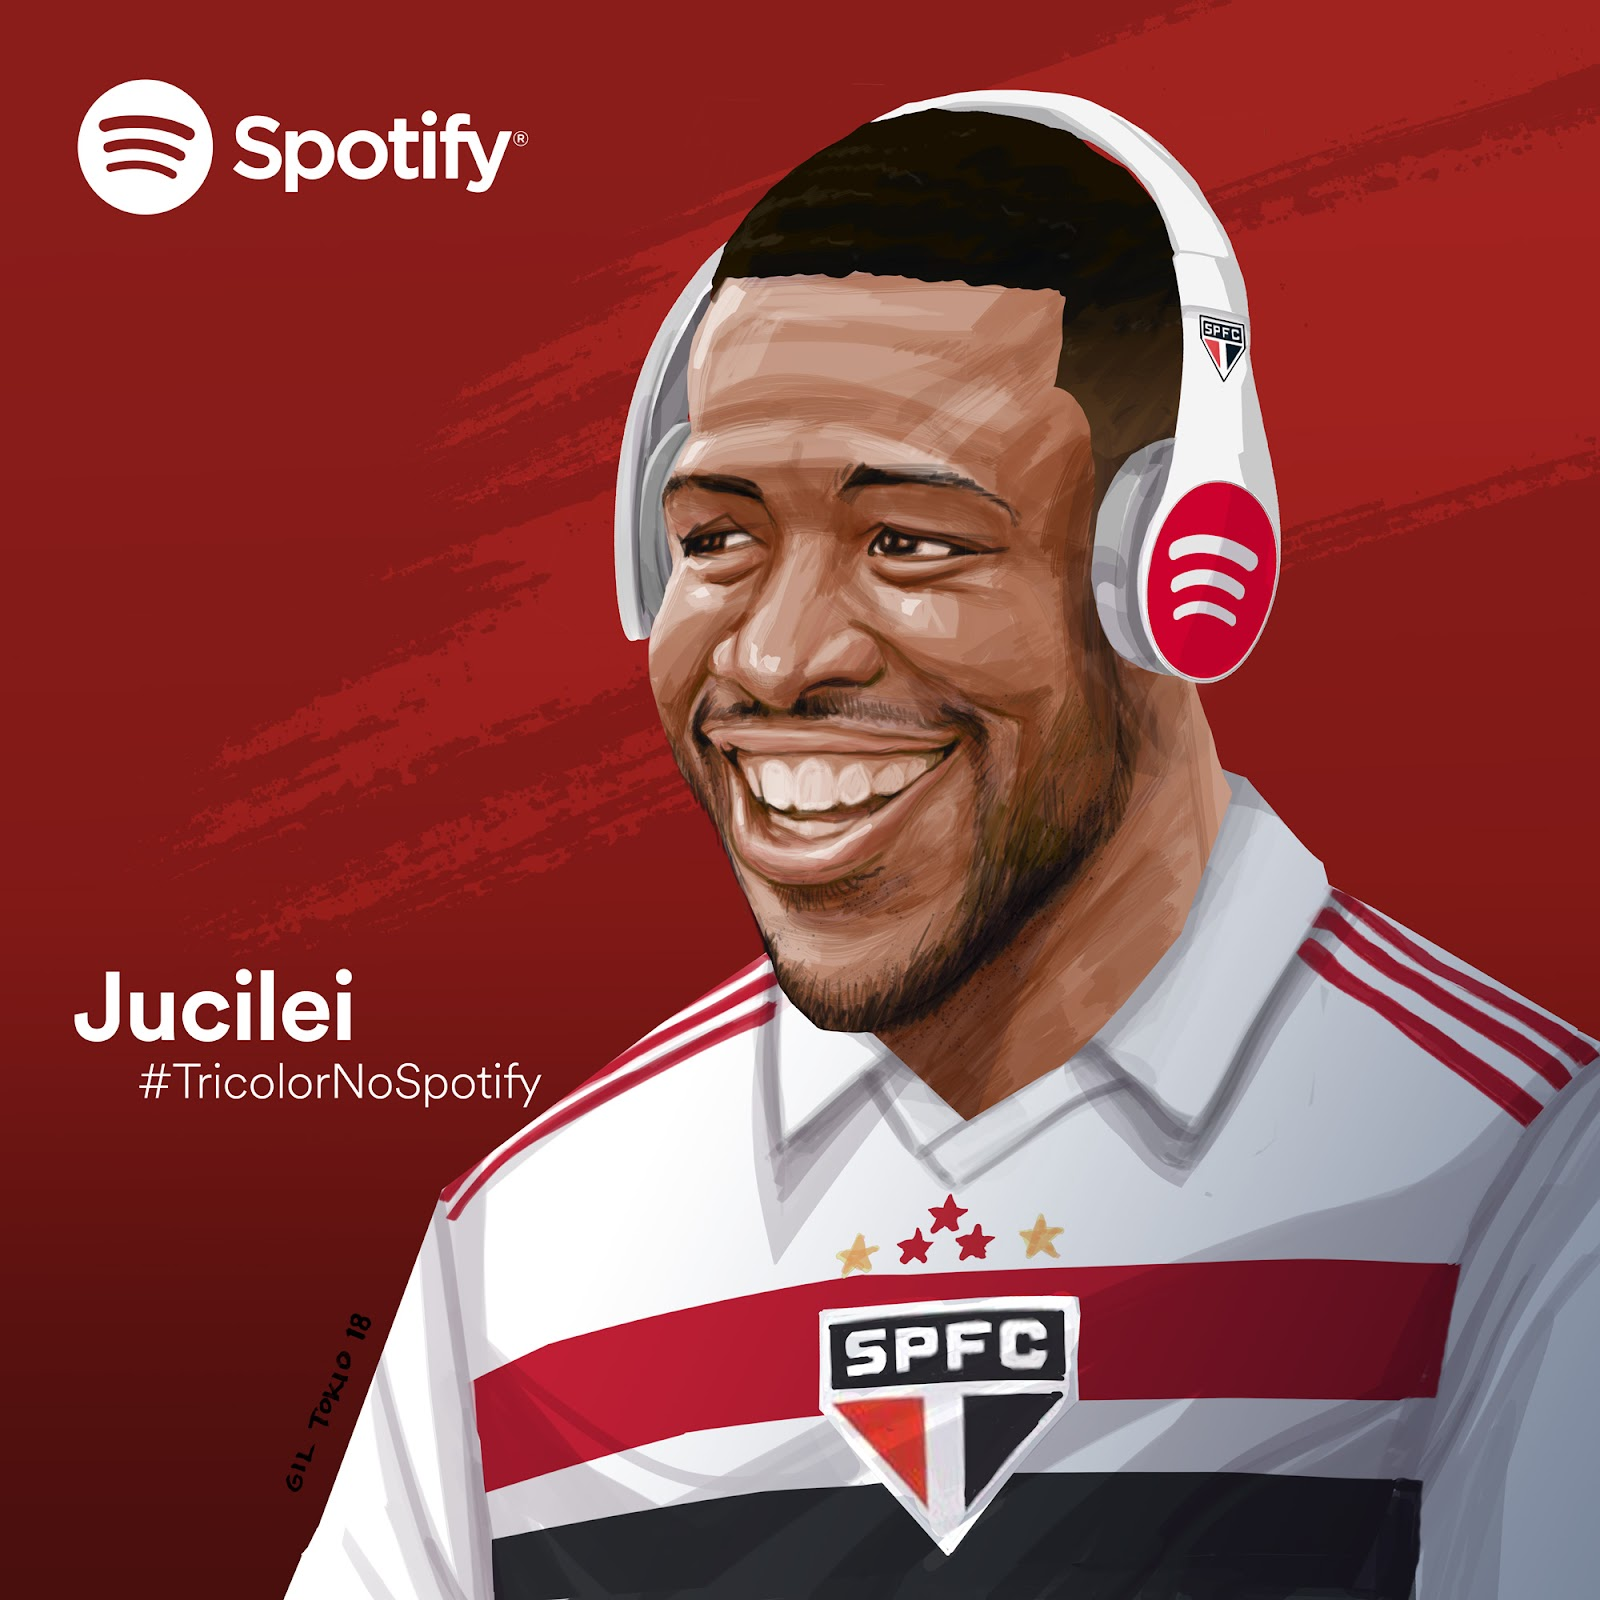 #TricolorNoSpotify: São Paulo faz parceria com Spotify no Brasil